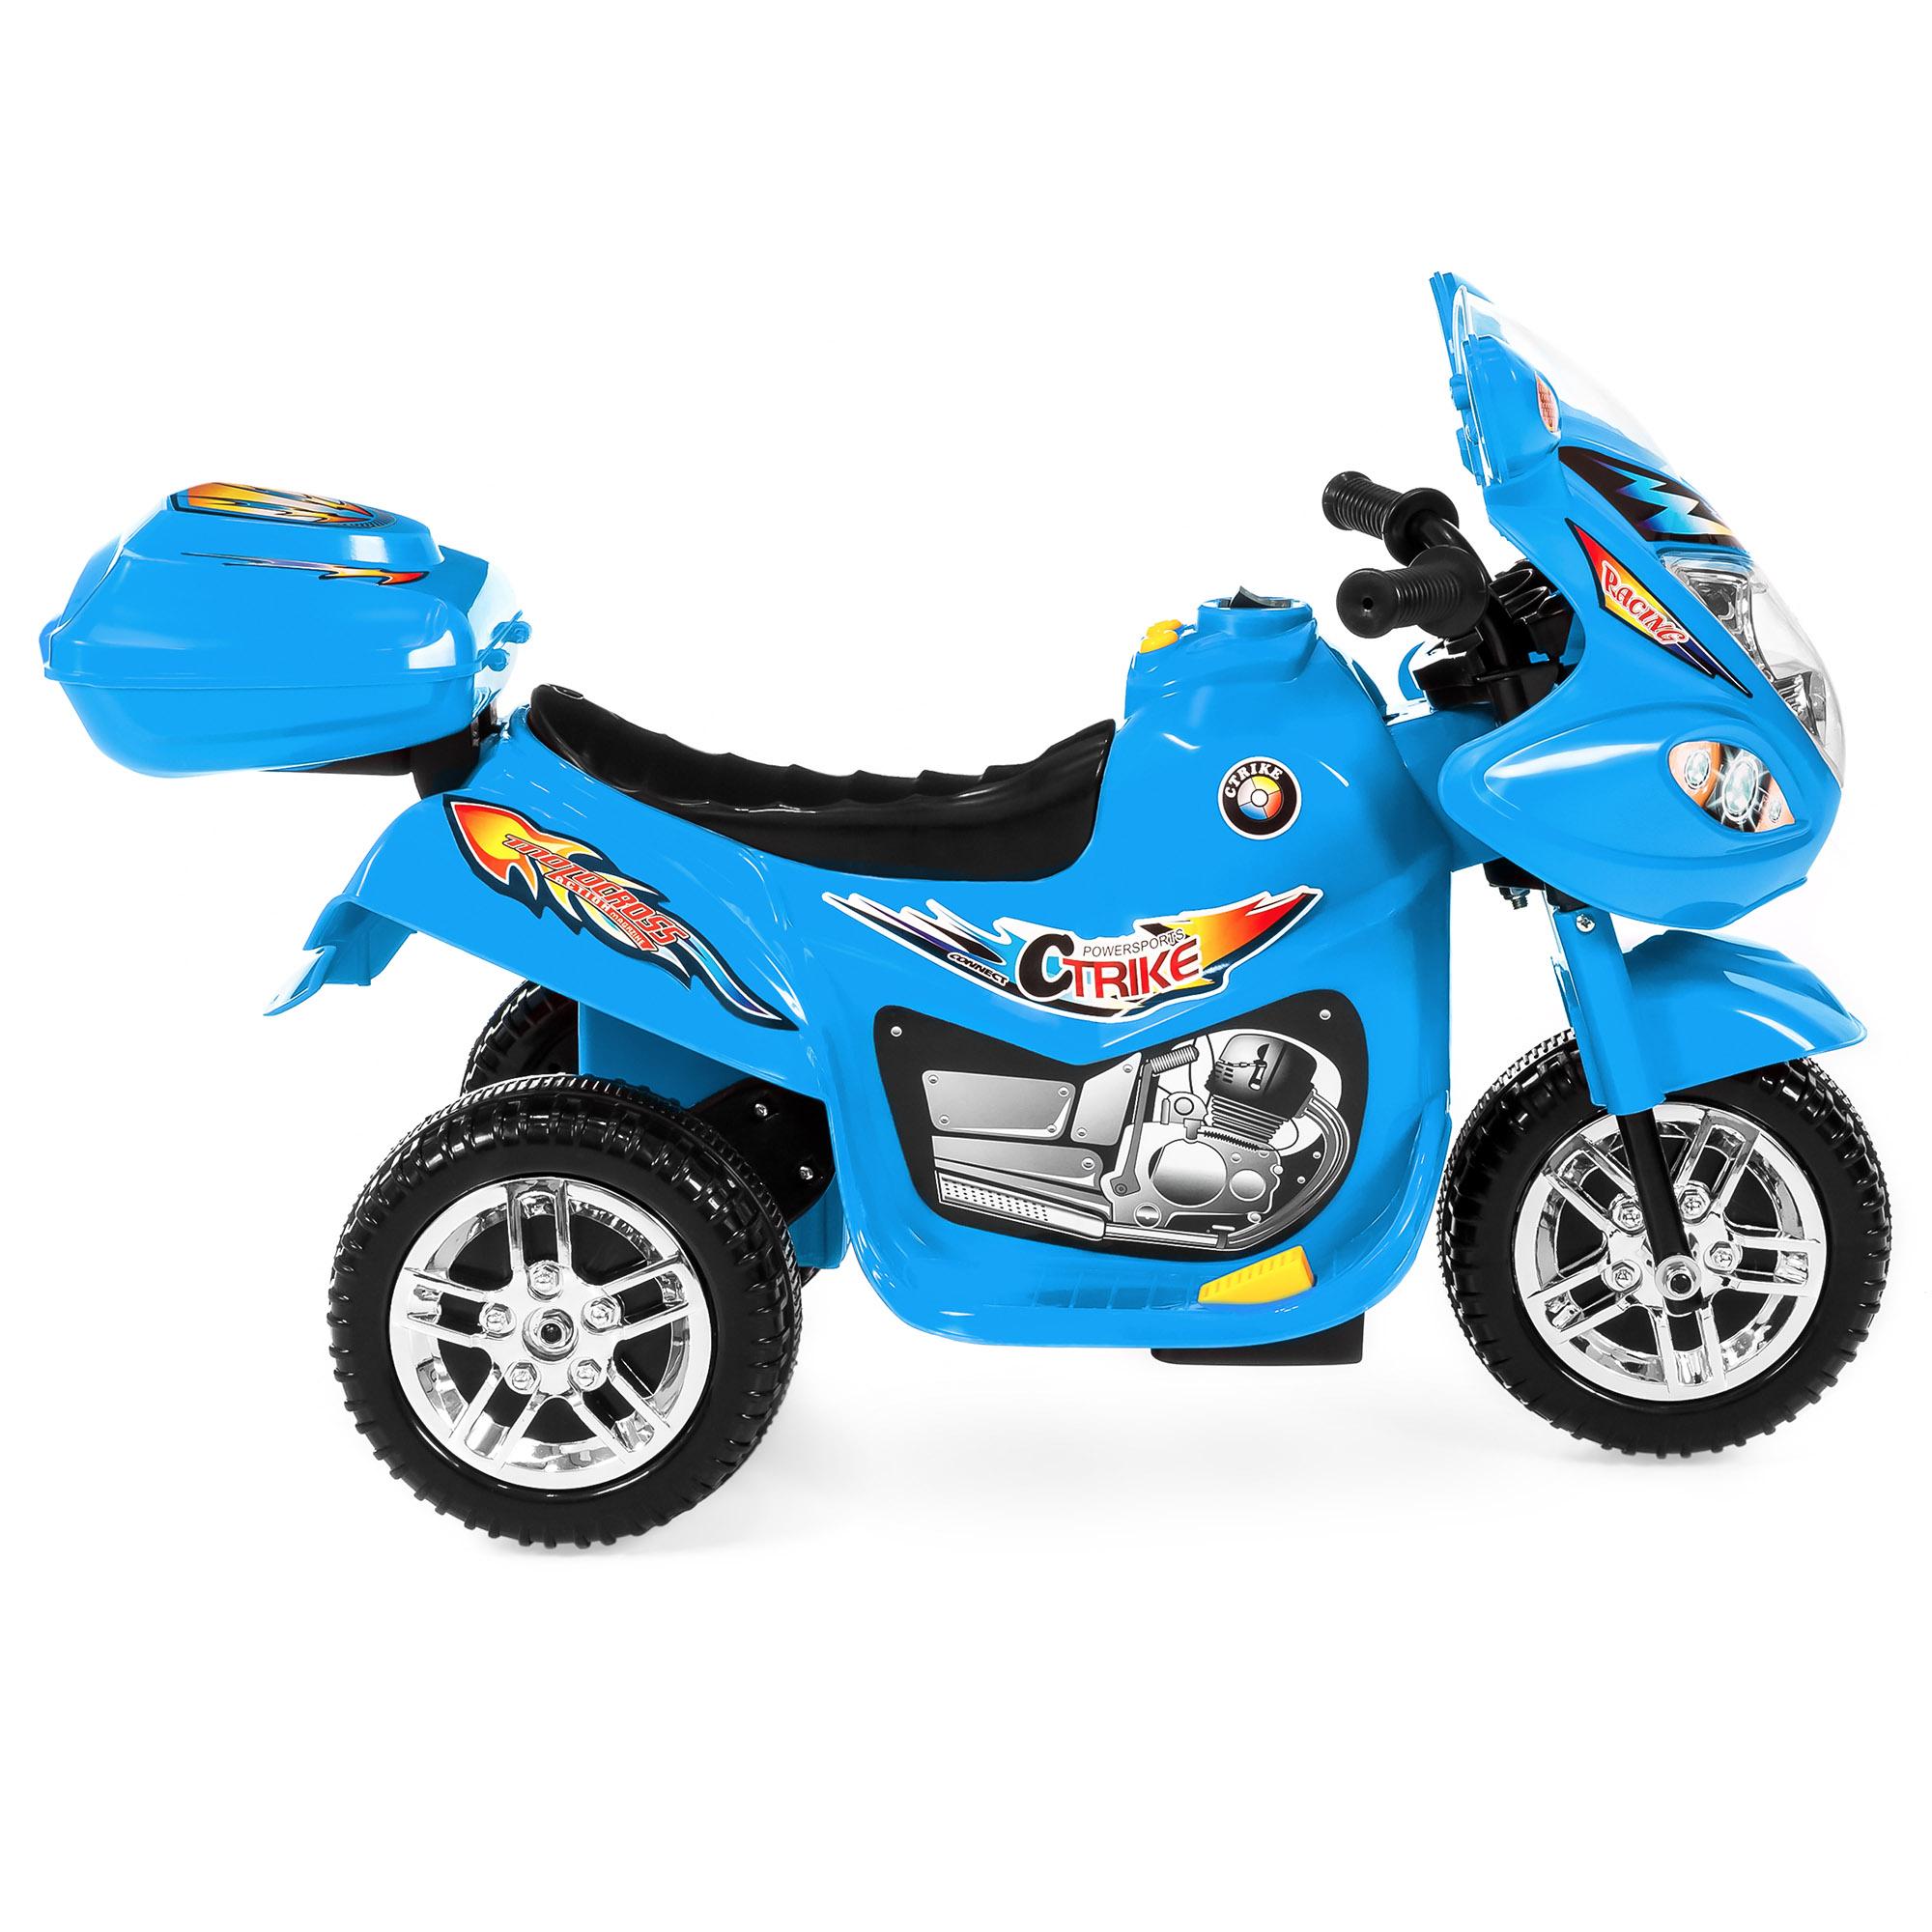 BCP-6V-Kids-3-Wheel-Motorcycle-Ride-On-Toy-w-LED-Lights-Music-Storage thumbnail 15